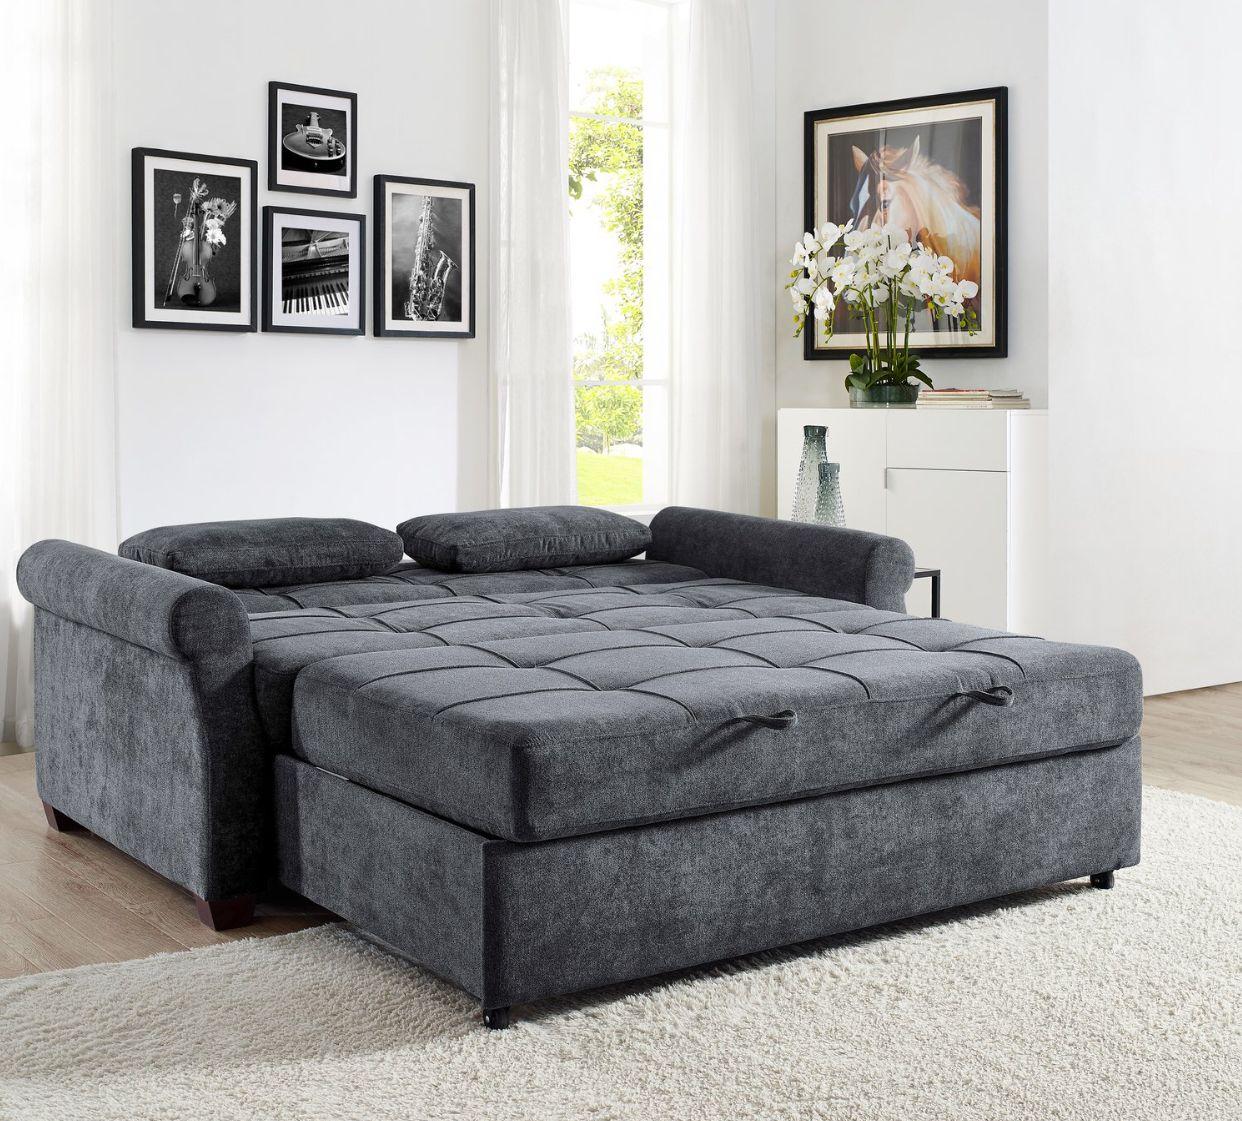 Pin by Lisa Barnes on Products I Love Best sleeper sofa